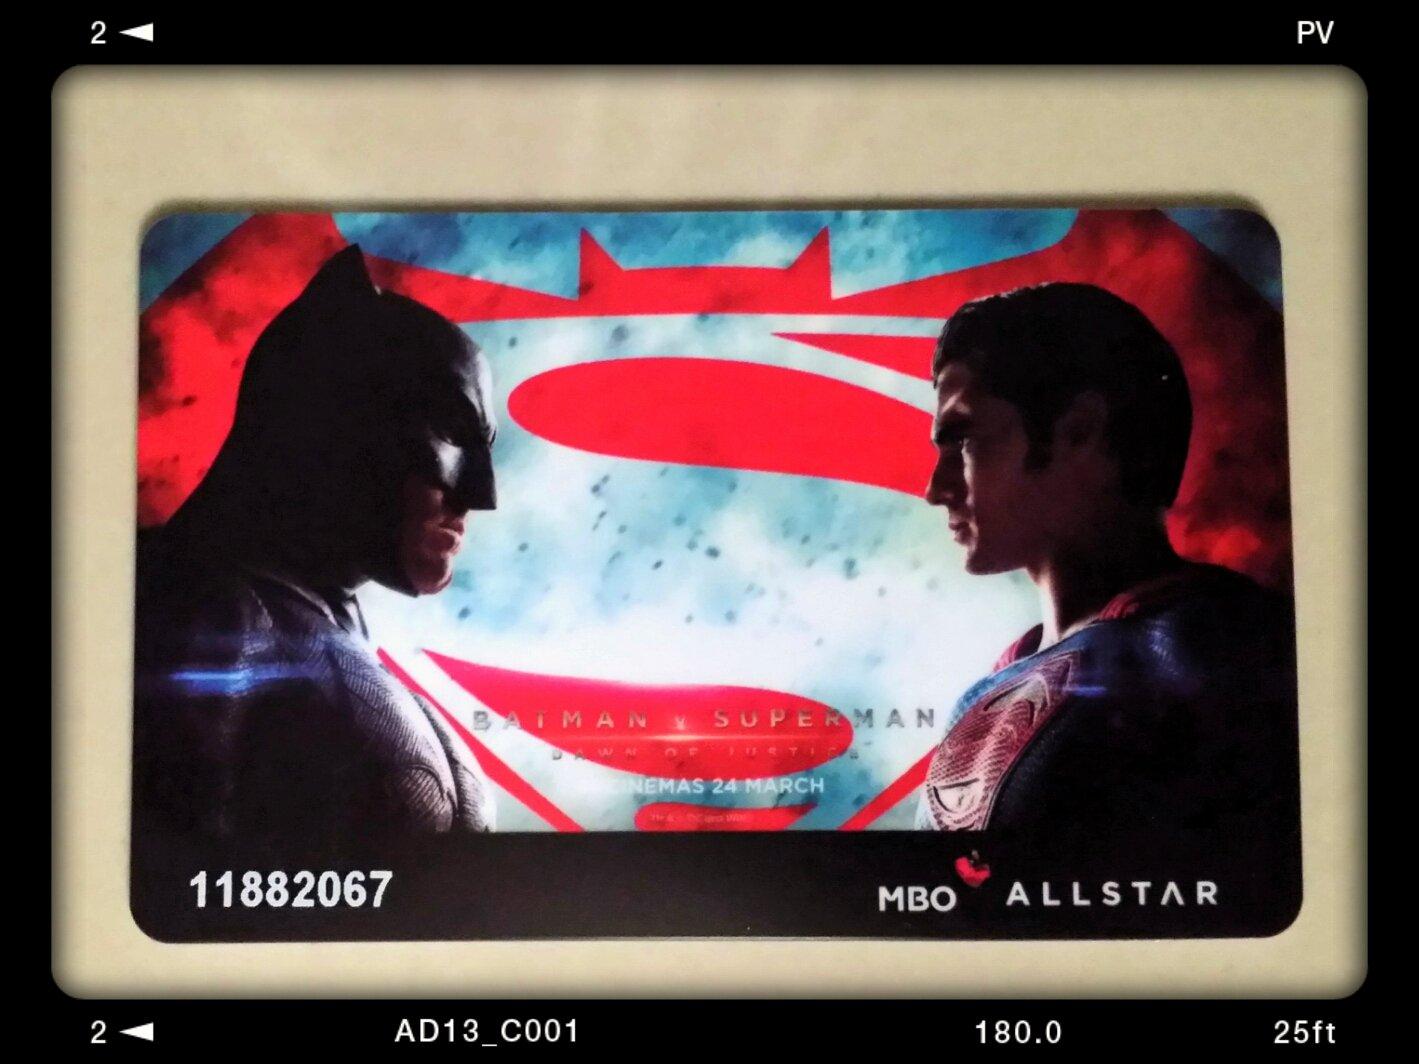 MBO Cinemas' Batman vs Superman: Dawn of Justice special edition membership card